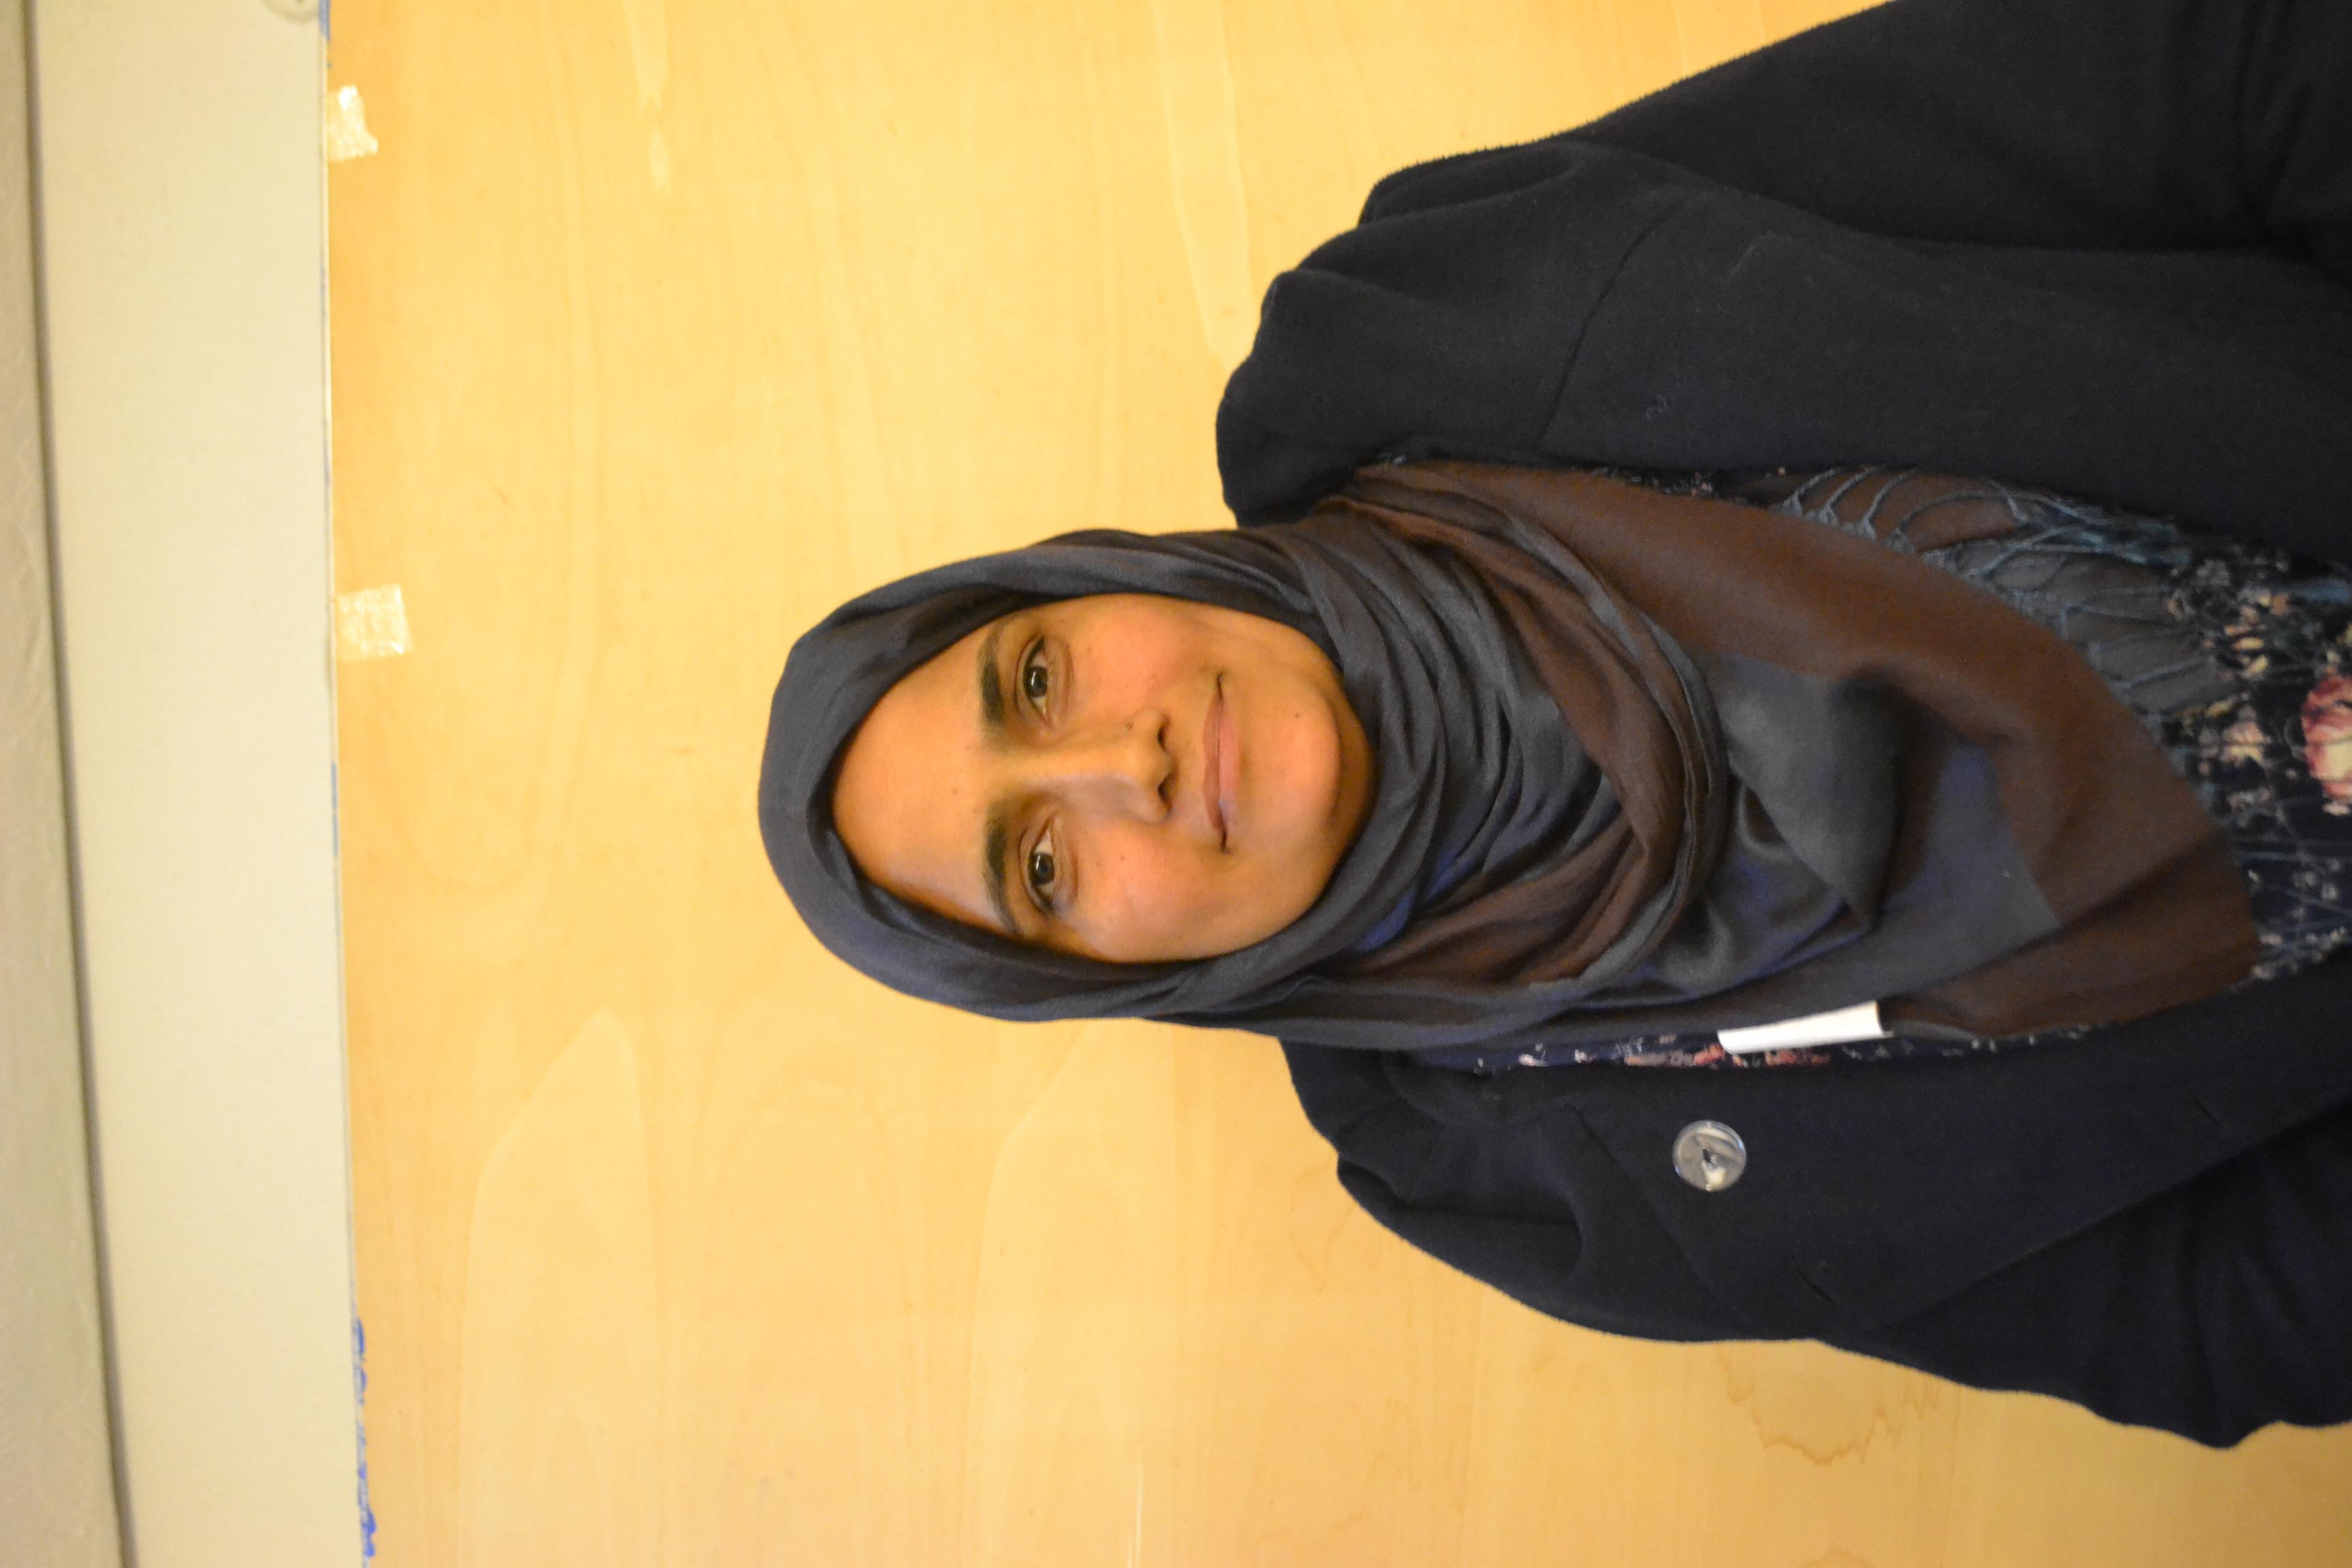 Naheed Inayat Khadim